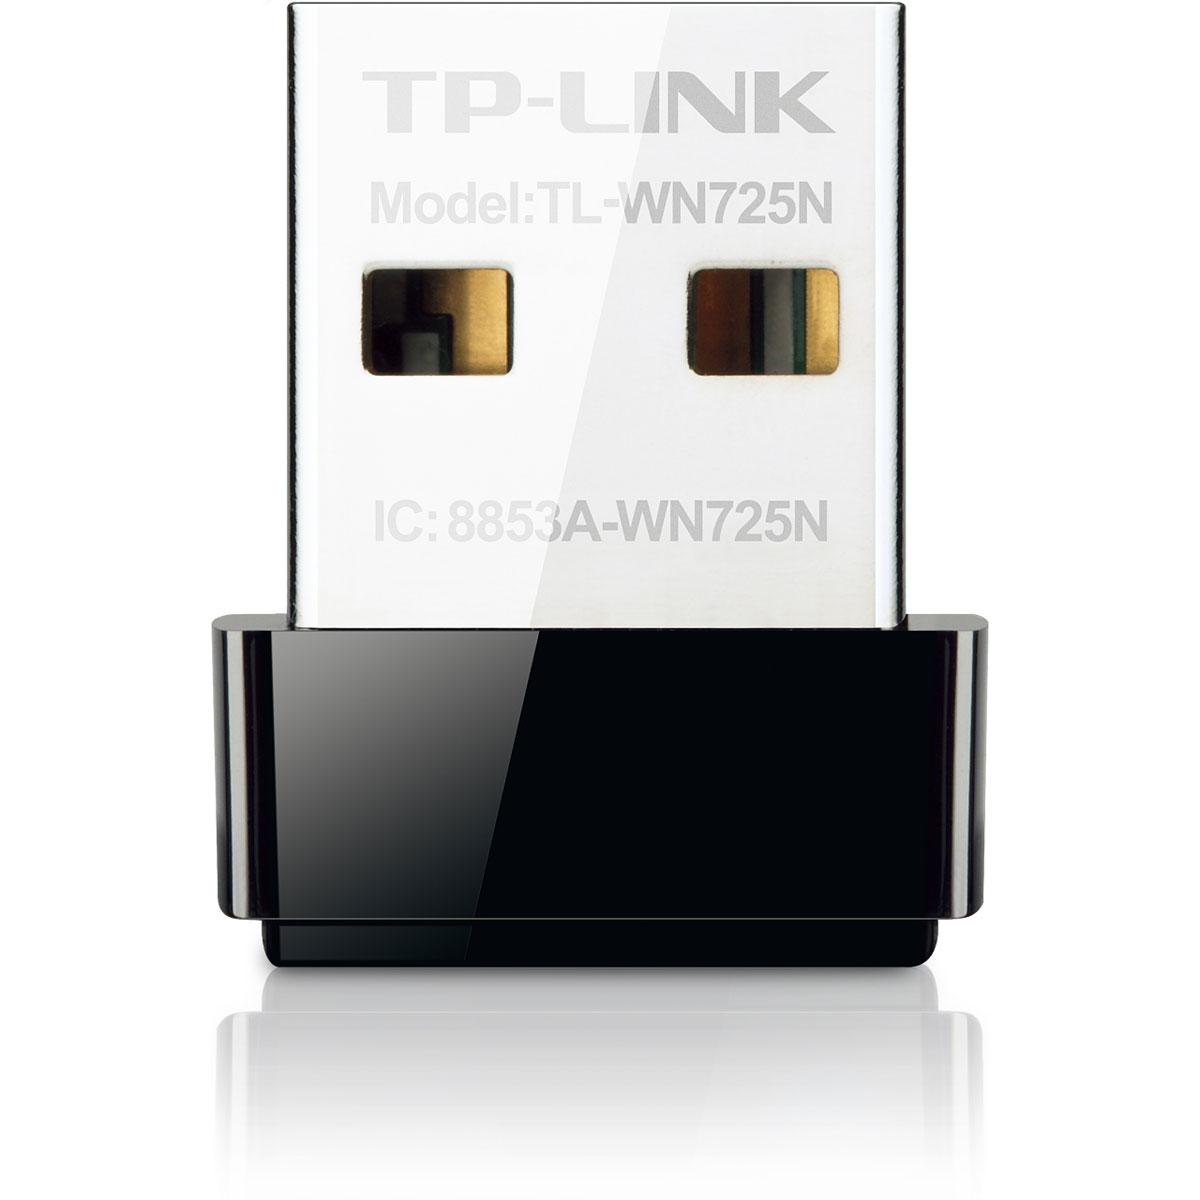 Carte réseau TP-LINK TL-WN725N Clé USB nano Wi-Fi N (150 Mbps)